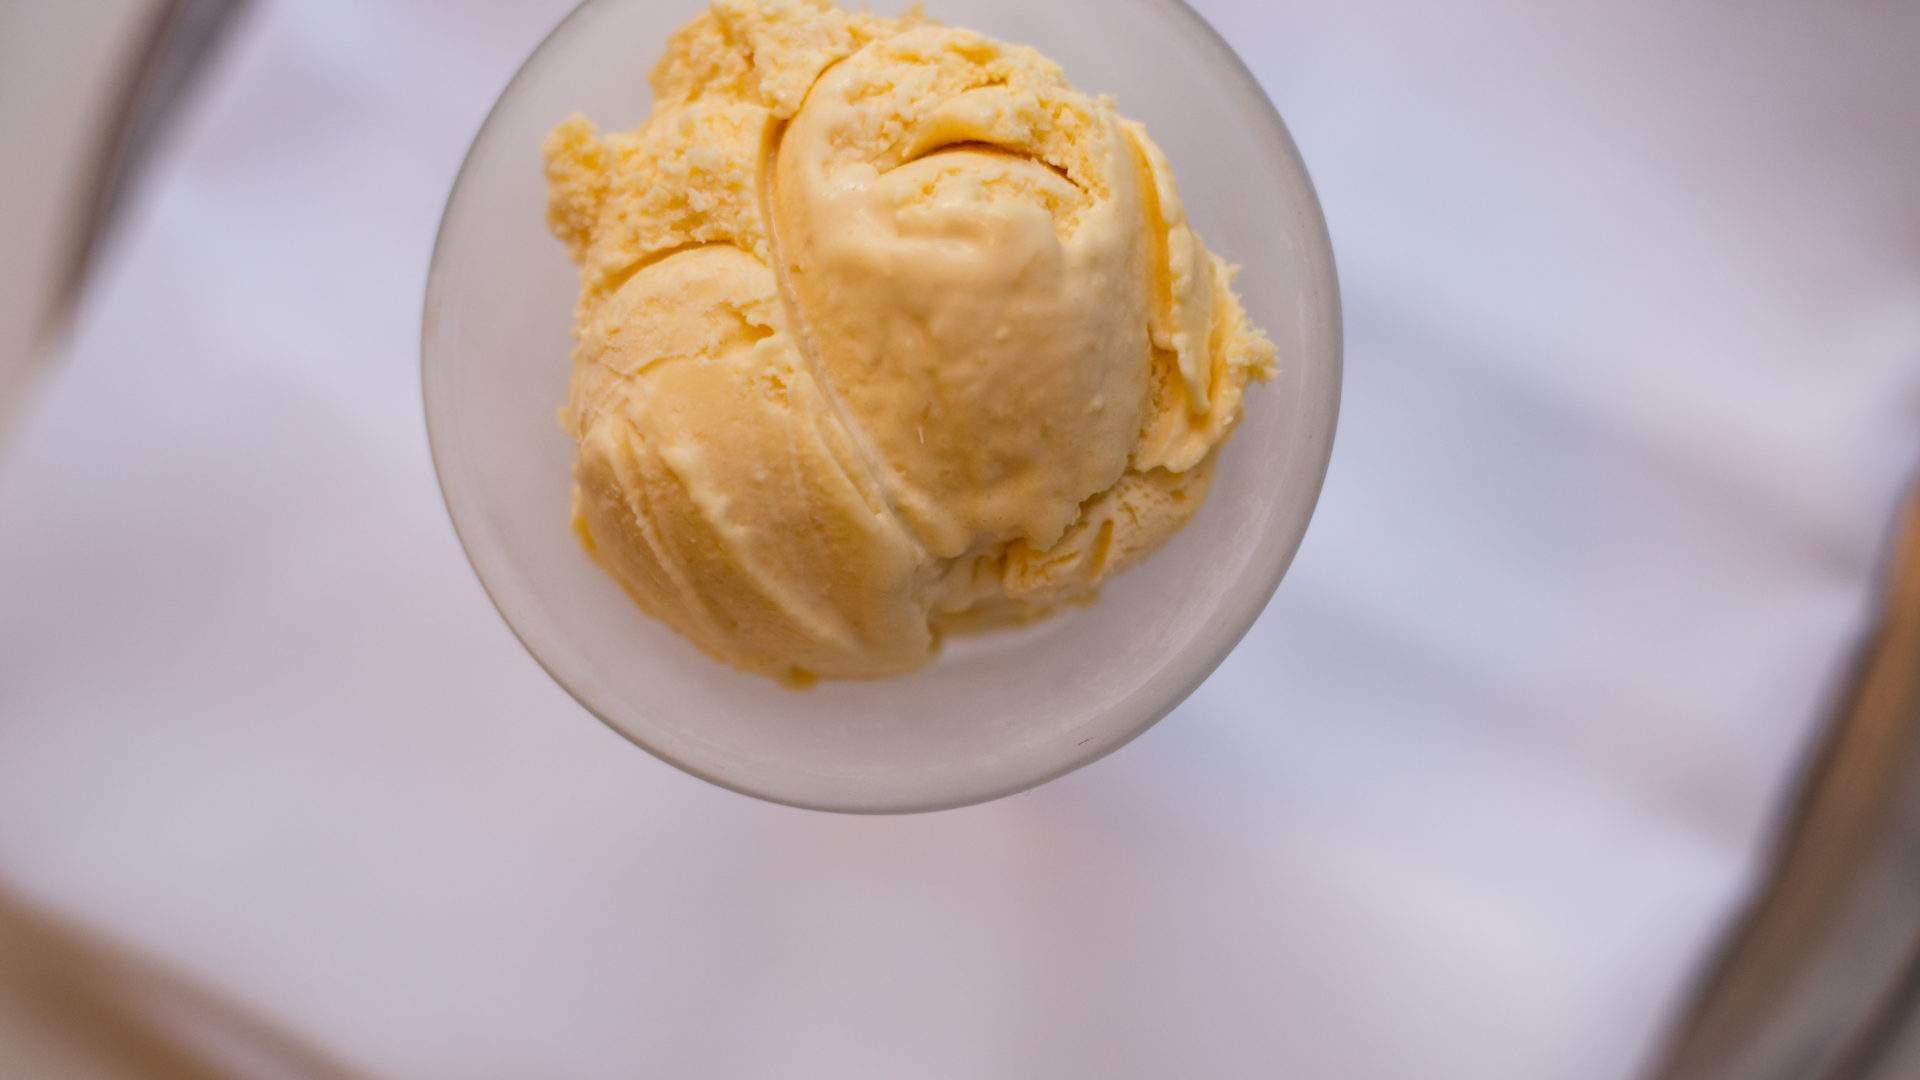 Field and Green ice cream cinnamon